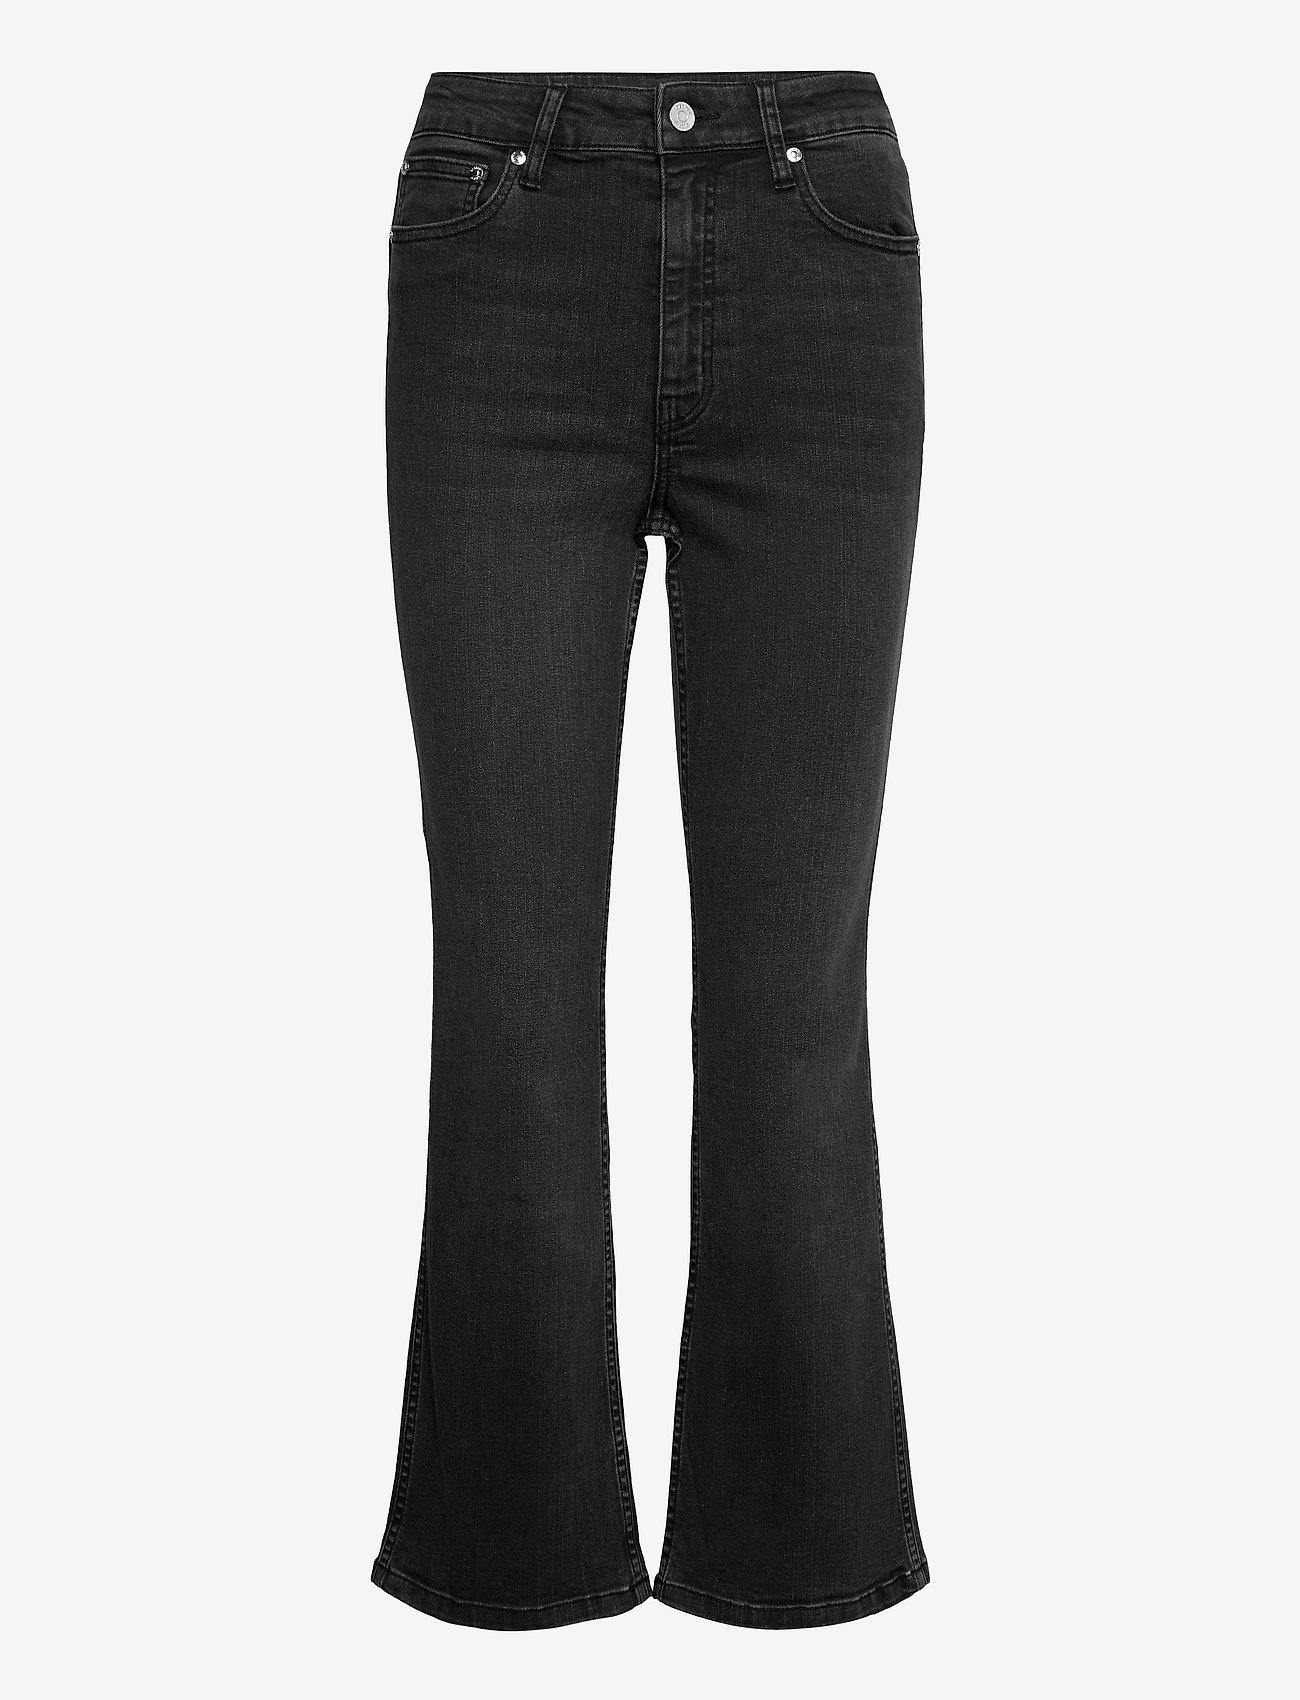 Gestuz - EmilindaGZ HW 7/8 flared pants NOOS - schlaghosen - washed grey - 1